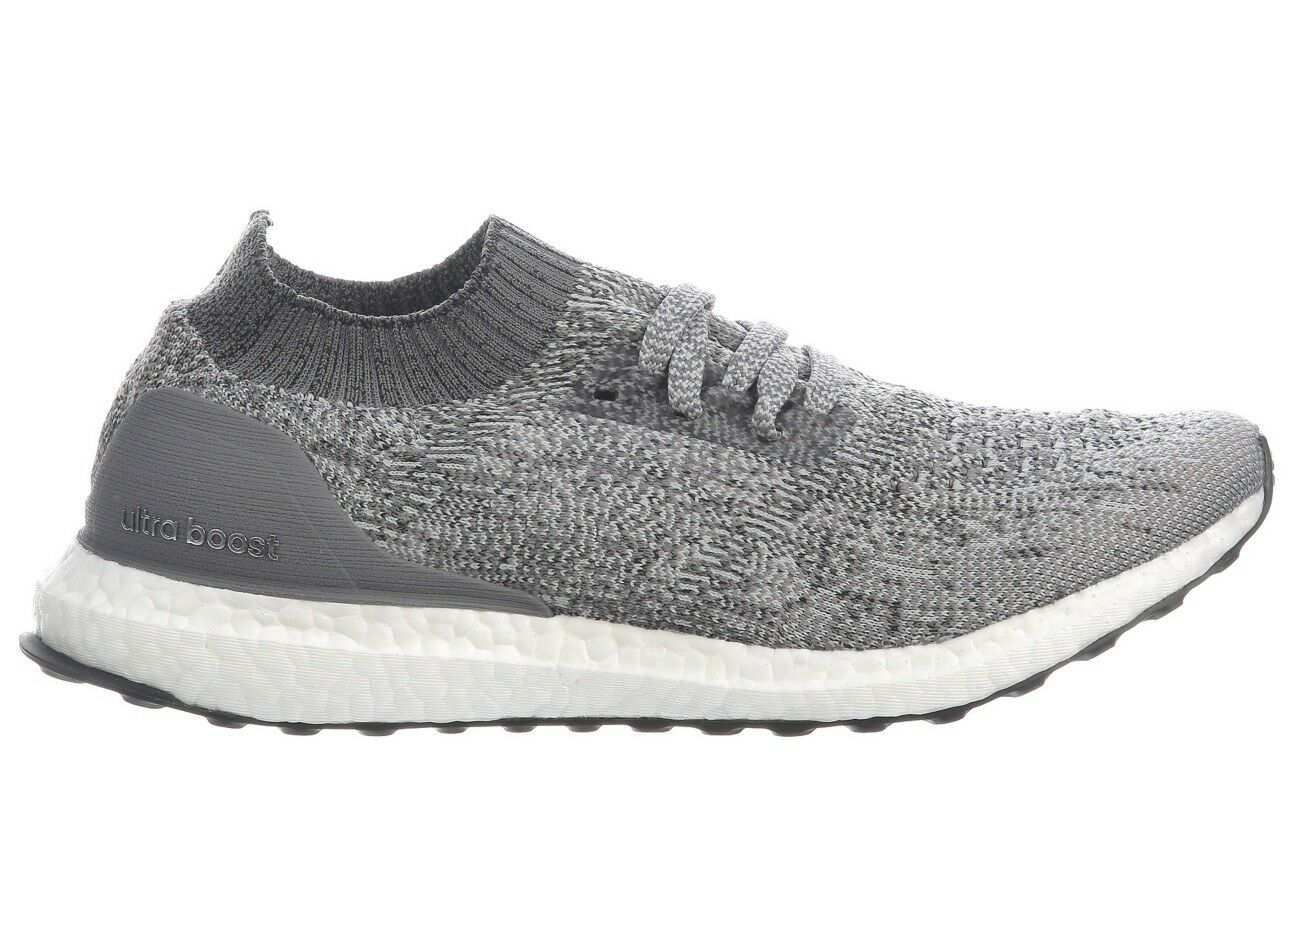 99f15b591 ... greece adidas ultra boost uncaged mens da9159 grey primeknit running  shoes size 10 e947e 2ec68 ...